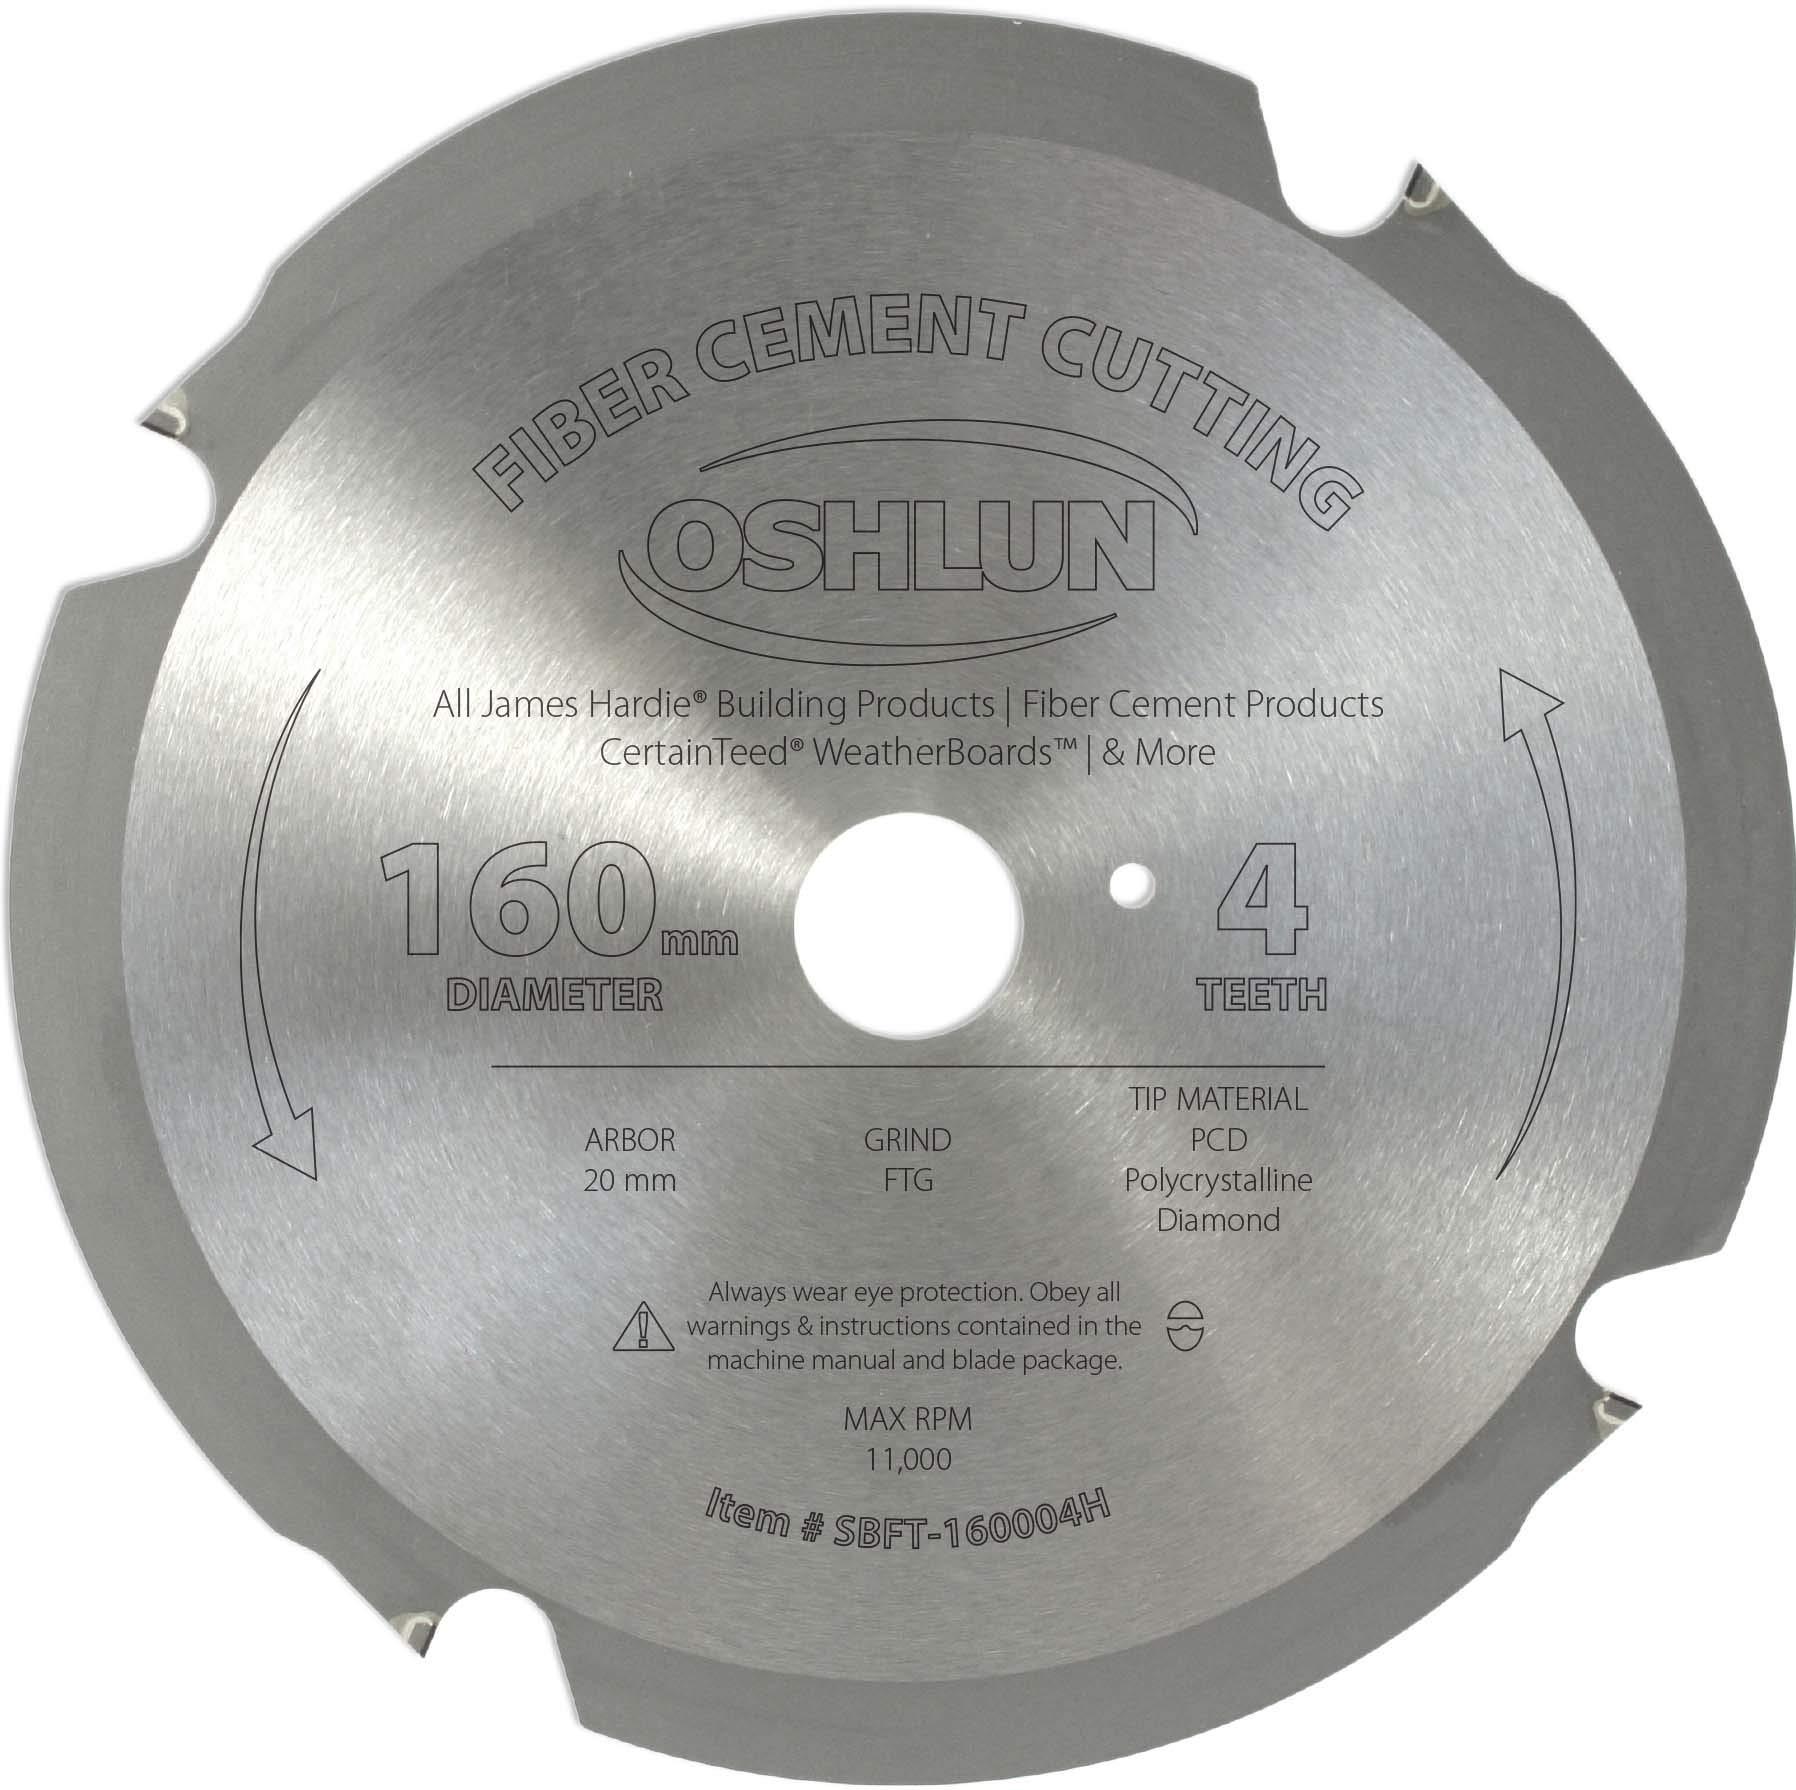 Disco Sierra OSHLUN SBFT 160004H 160 mm 4T FesPro Fiber Ce